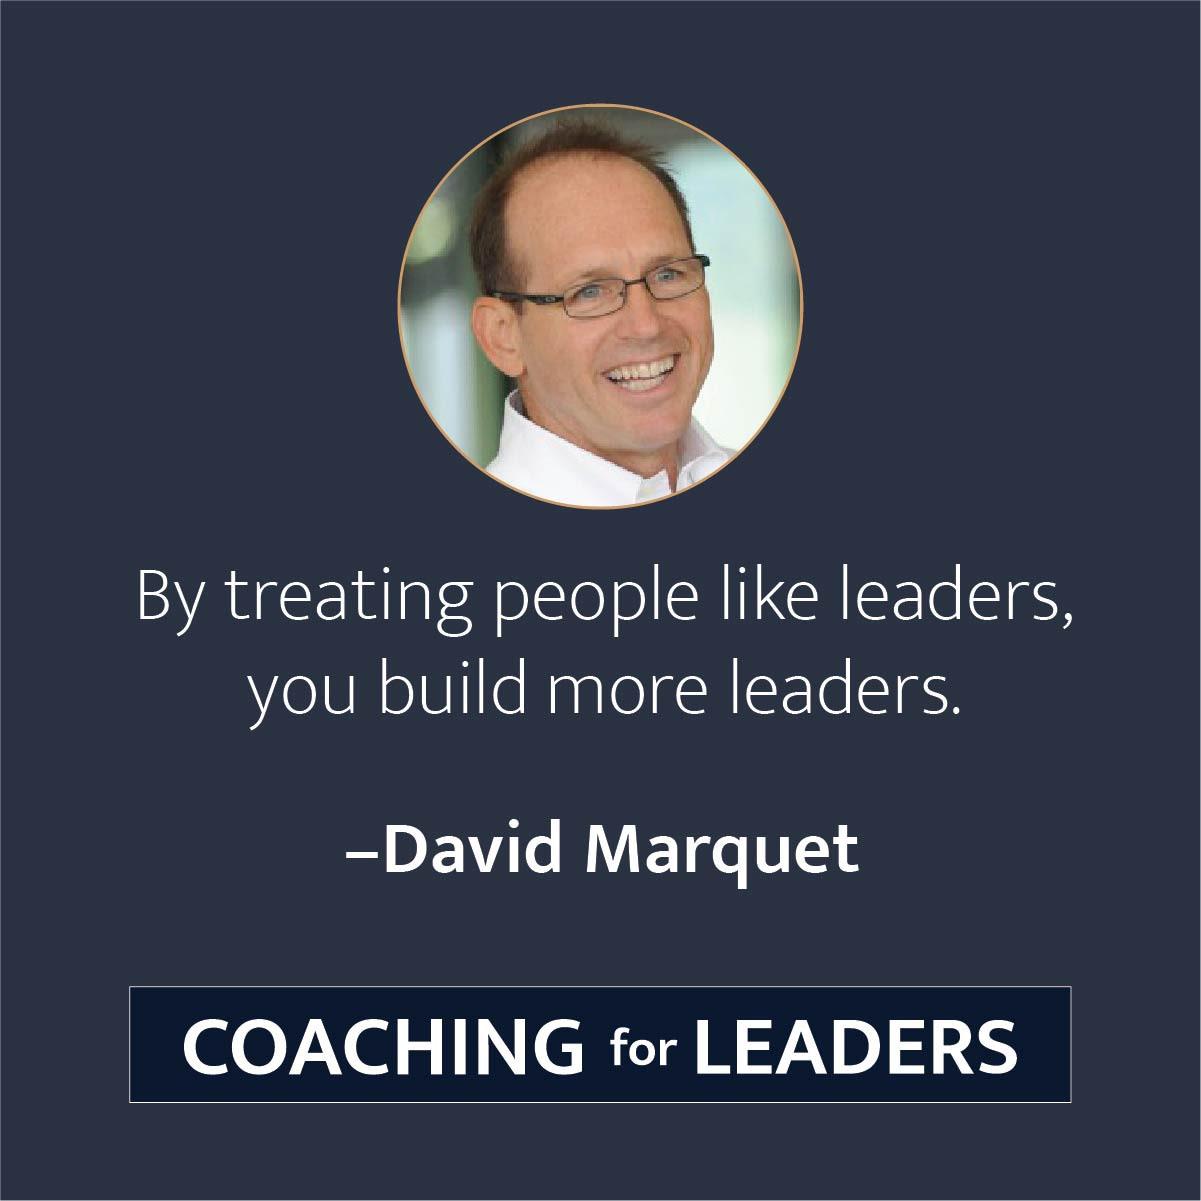 By treating people like leaders, you build more leaders.